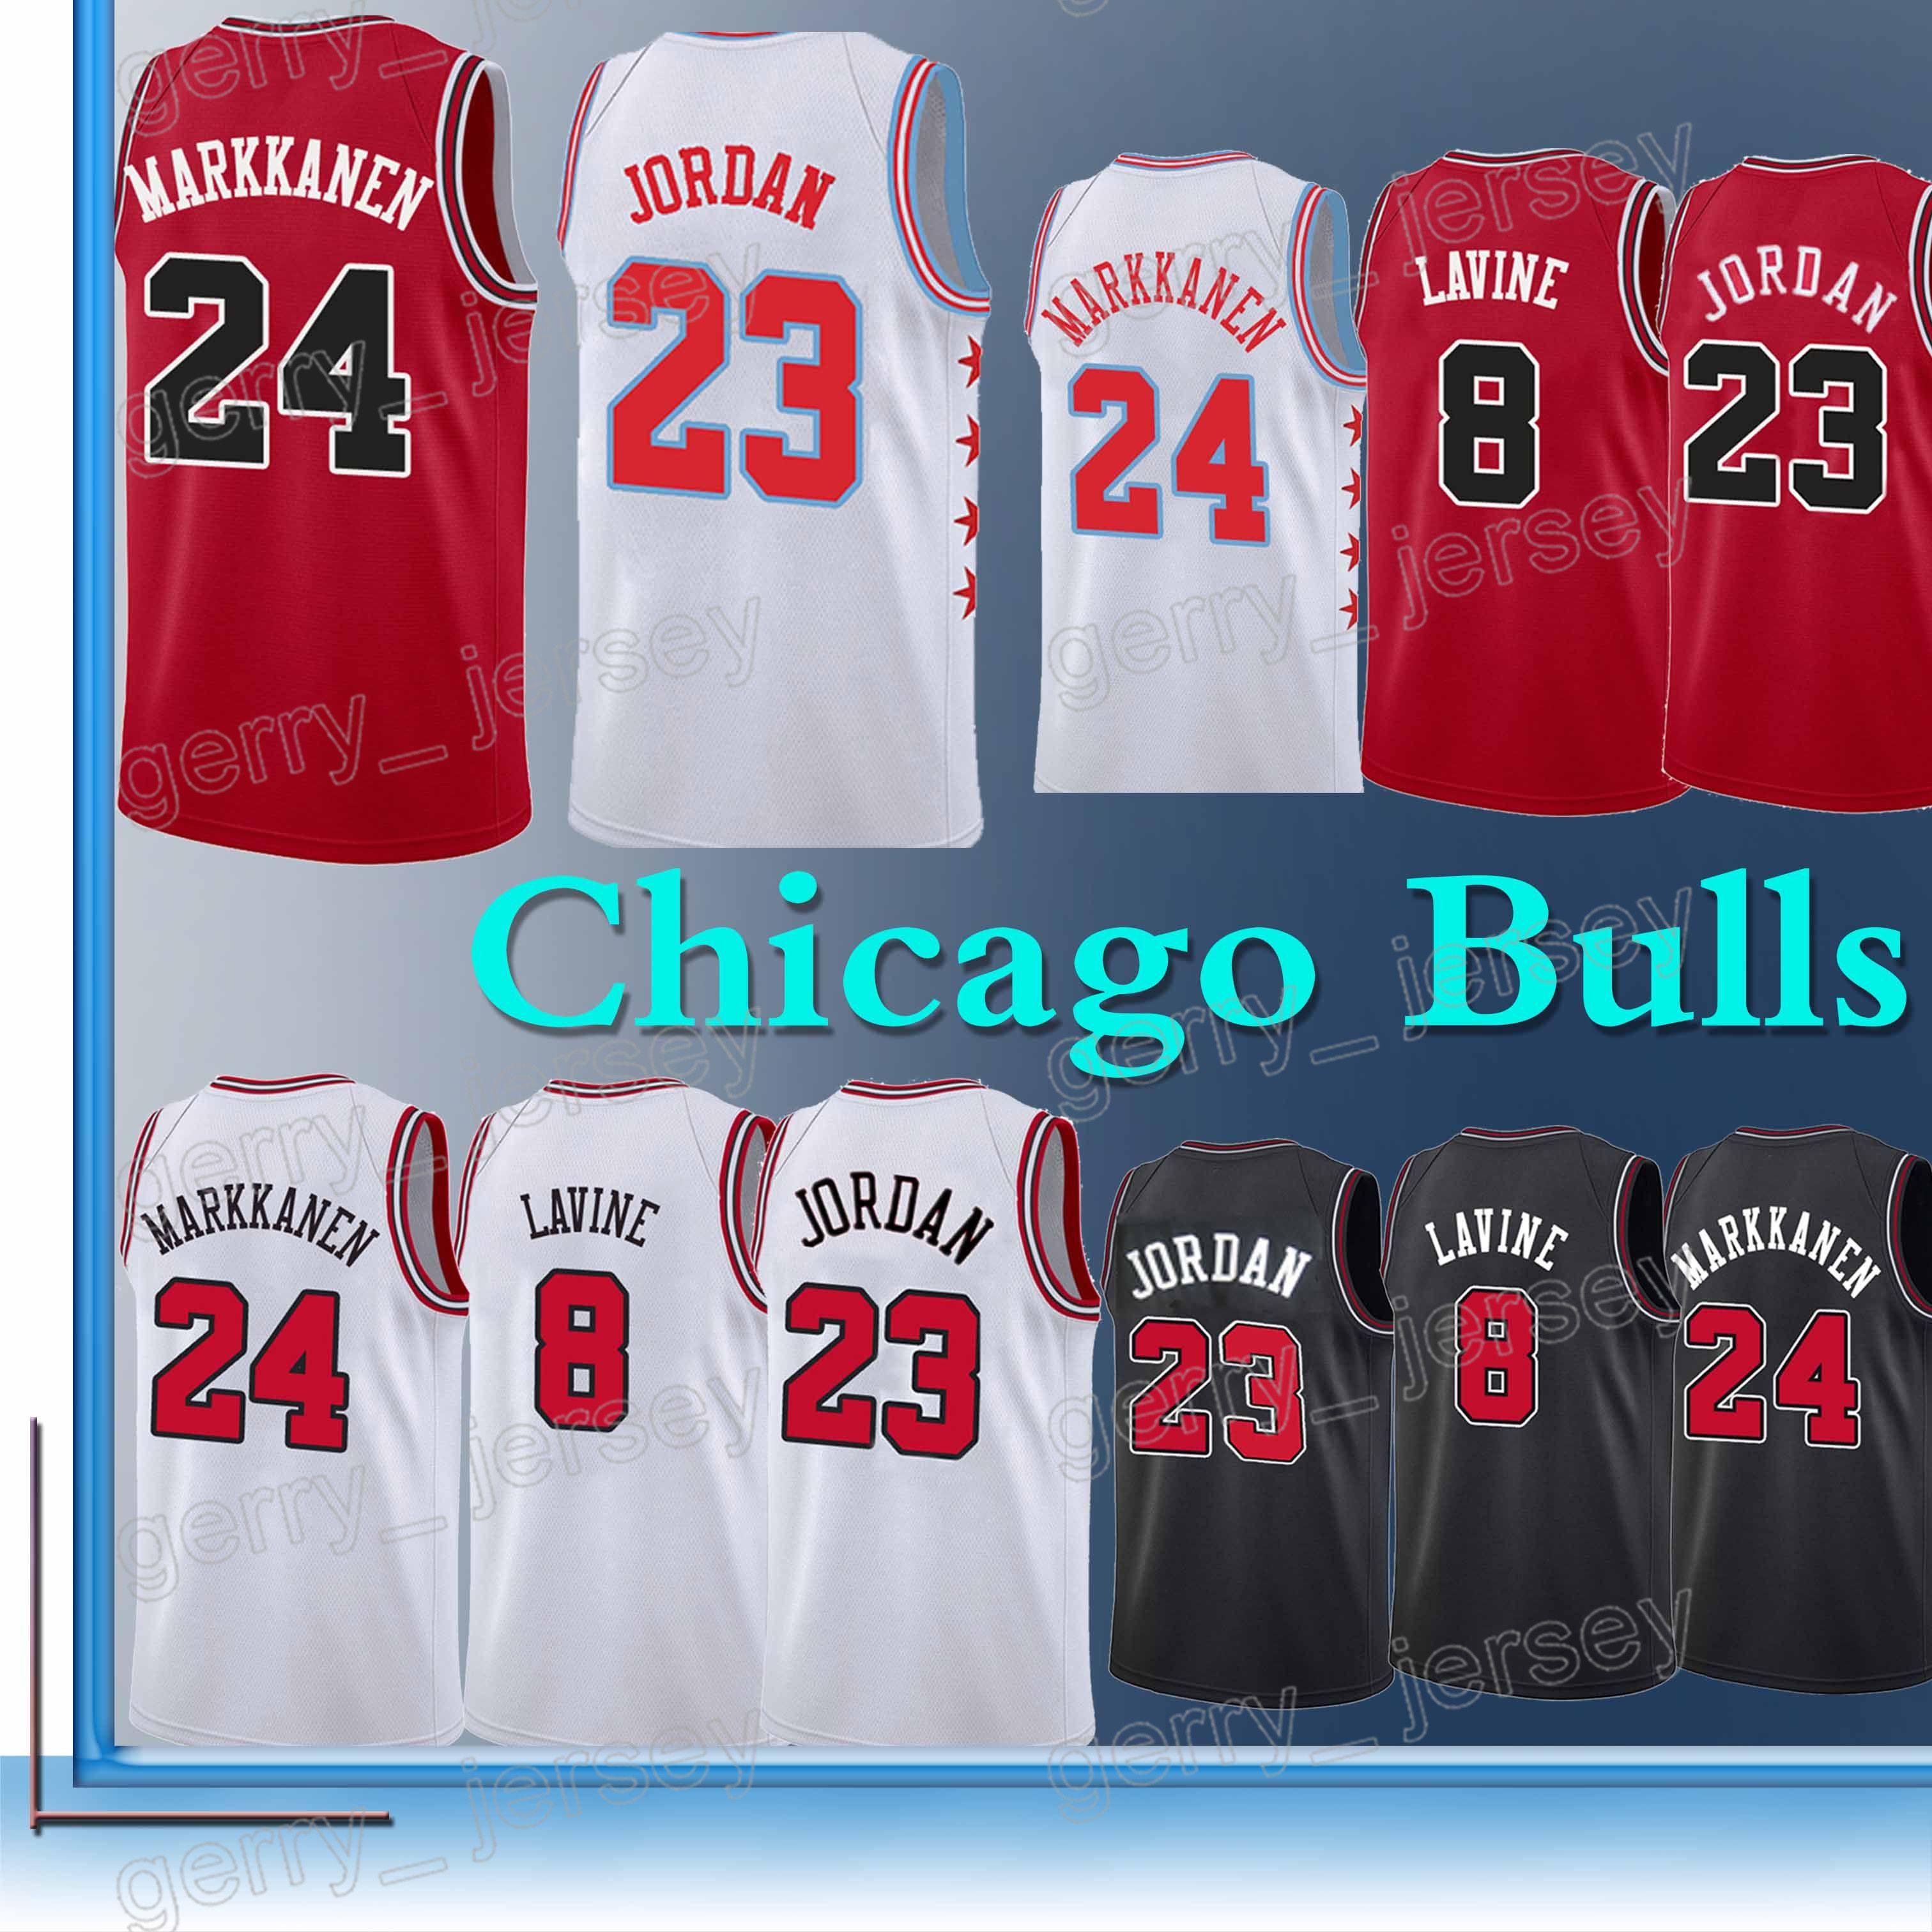 e44ccc3bdf0 uk 2018 chicago bulls jersey 23 mj 24 lauri markkanen 8 zach lavine 34 wendell  carter .